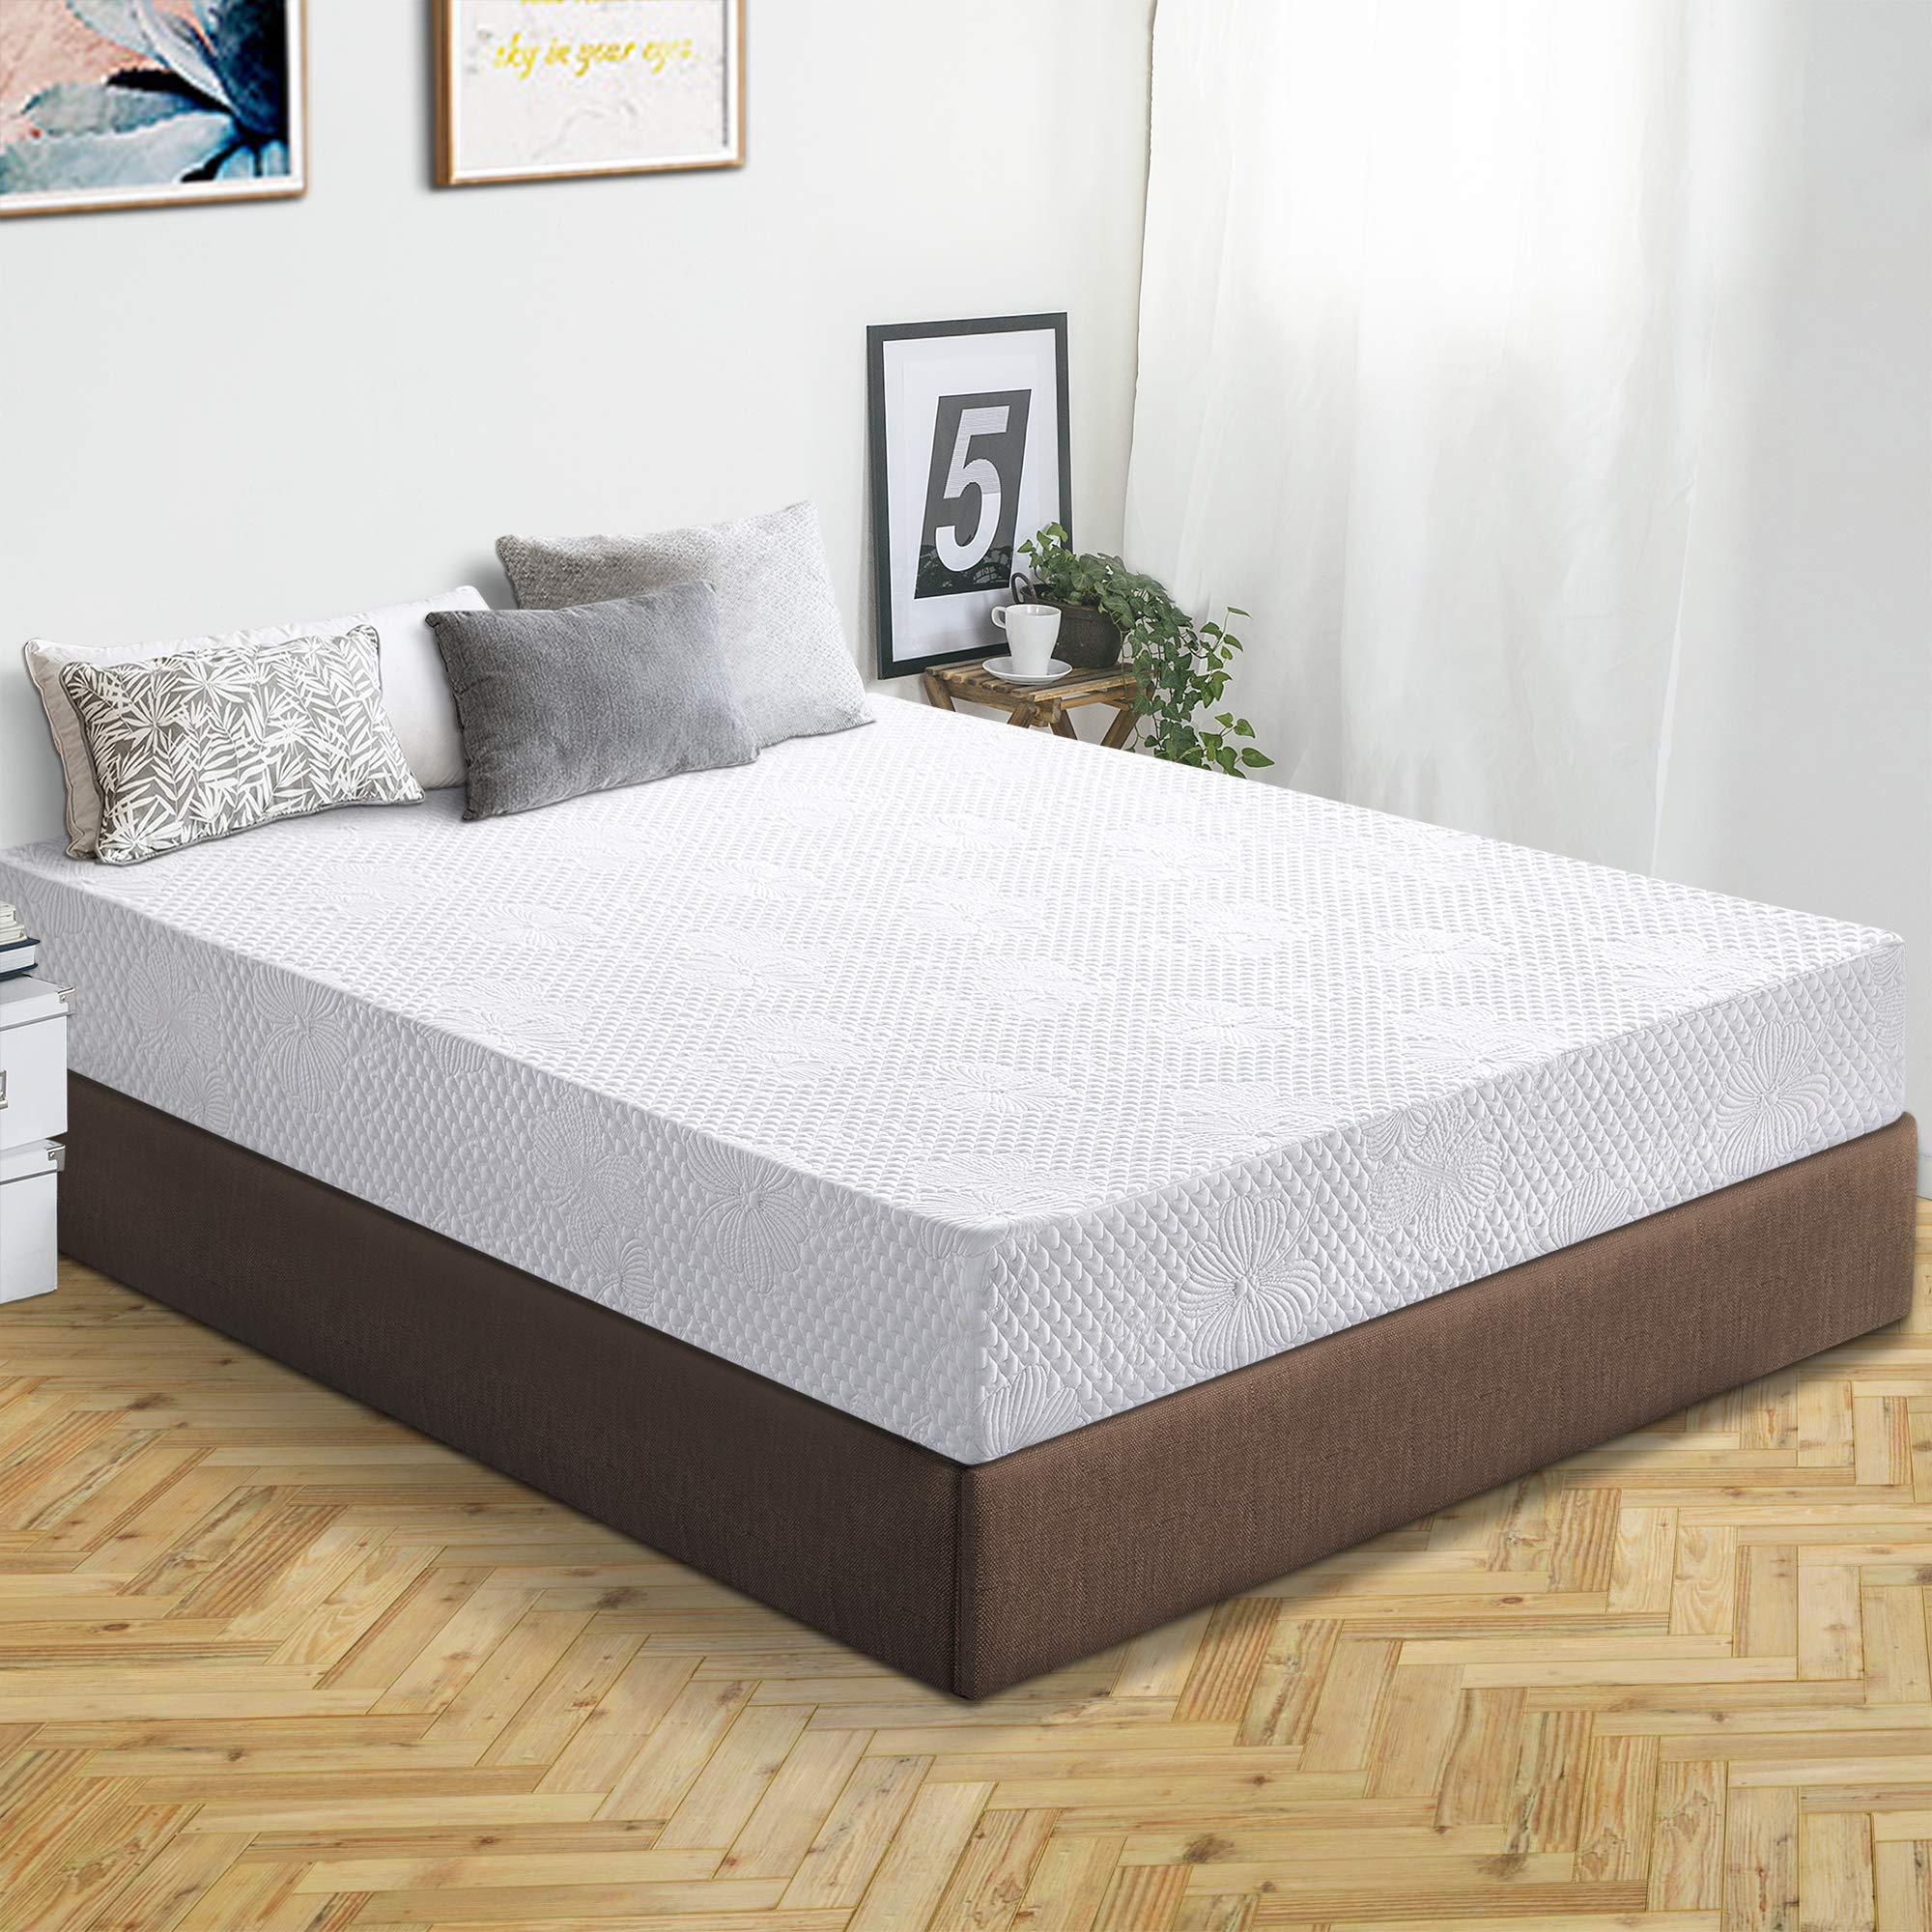 Olee Sleep 6 Inch Ventilated Multi Layered Memory Foam Mattress 06FM01F